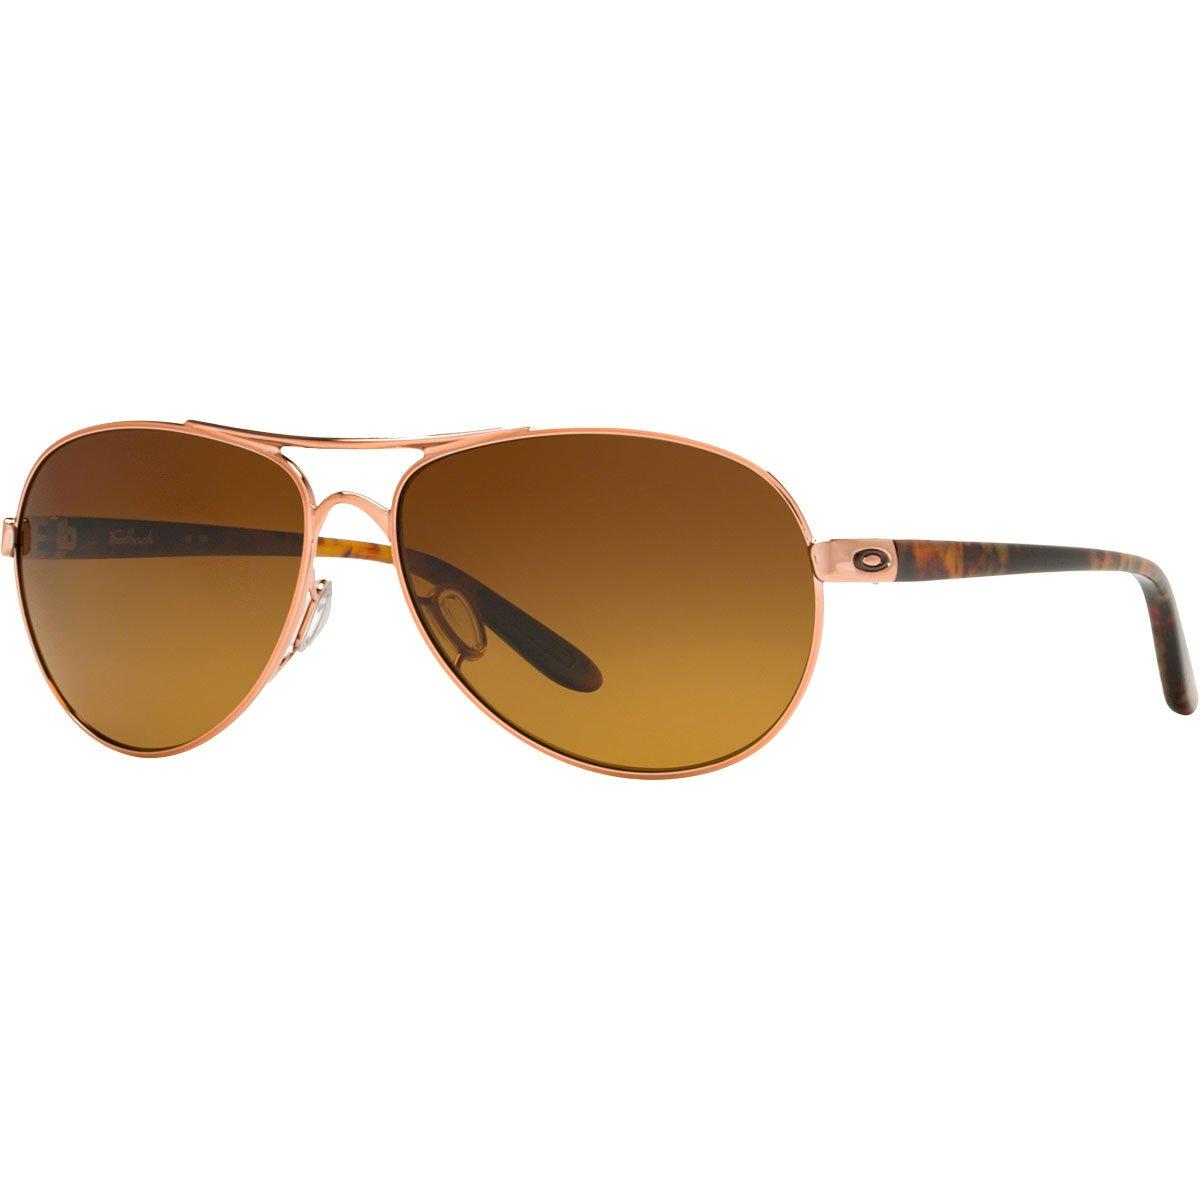 Oakley Women's Feedback Polarized Aviator Sunglasses, Rose Gold, 59.01 mm